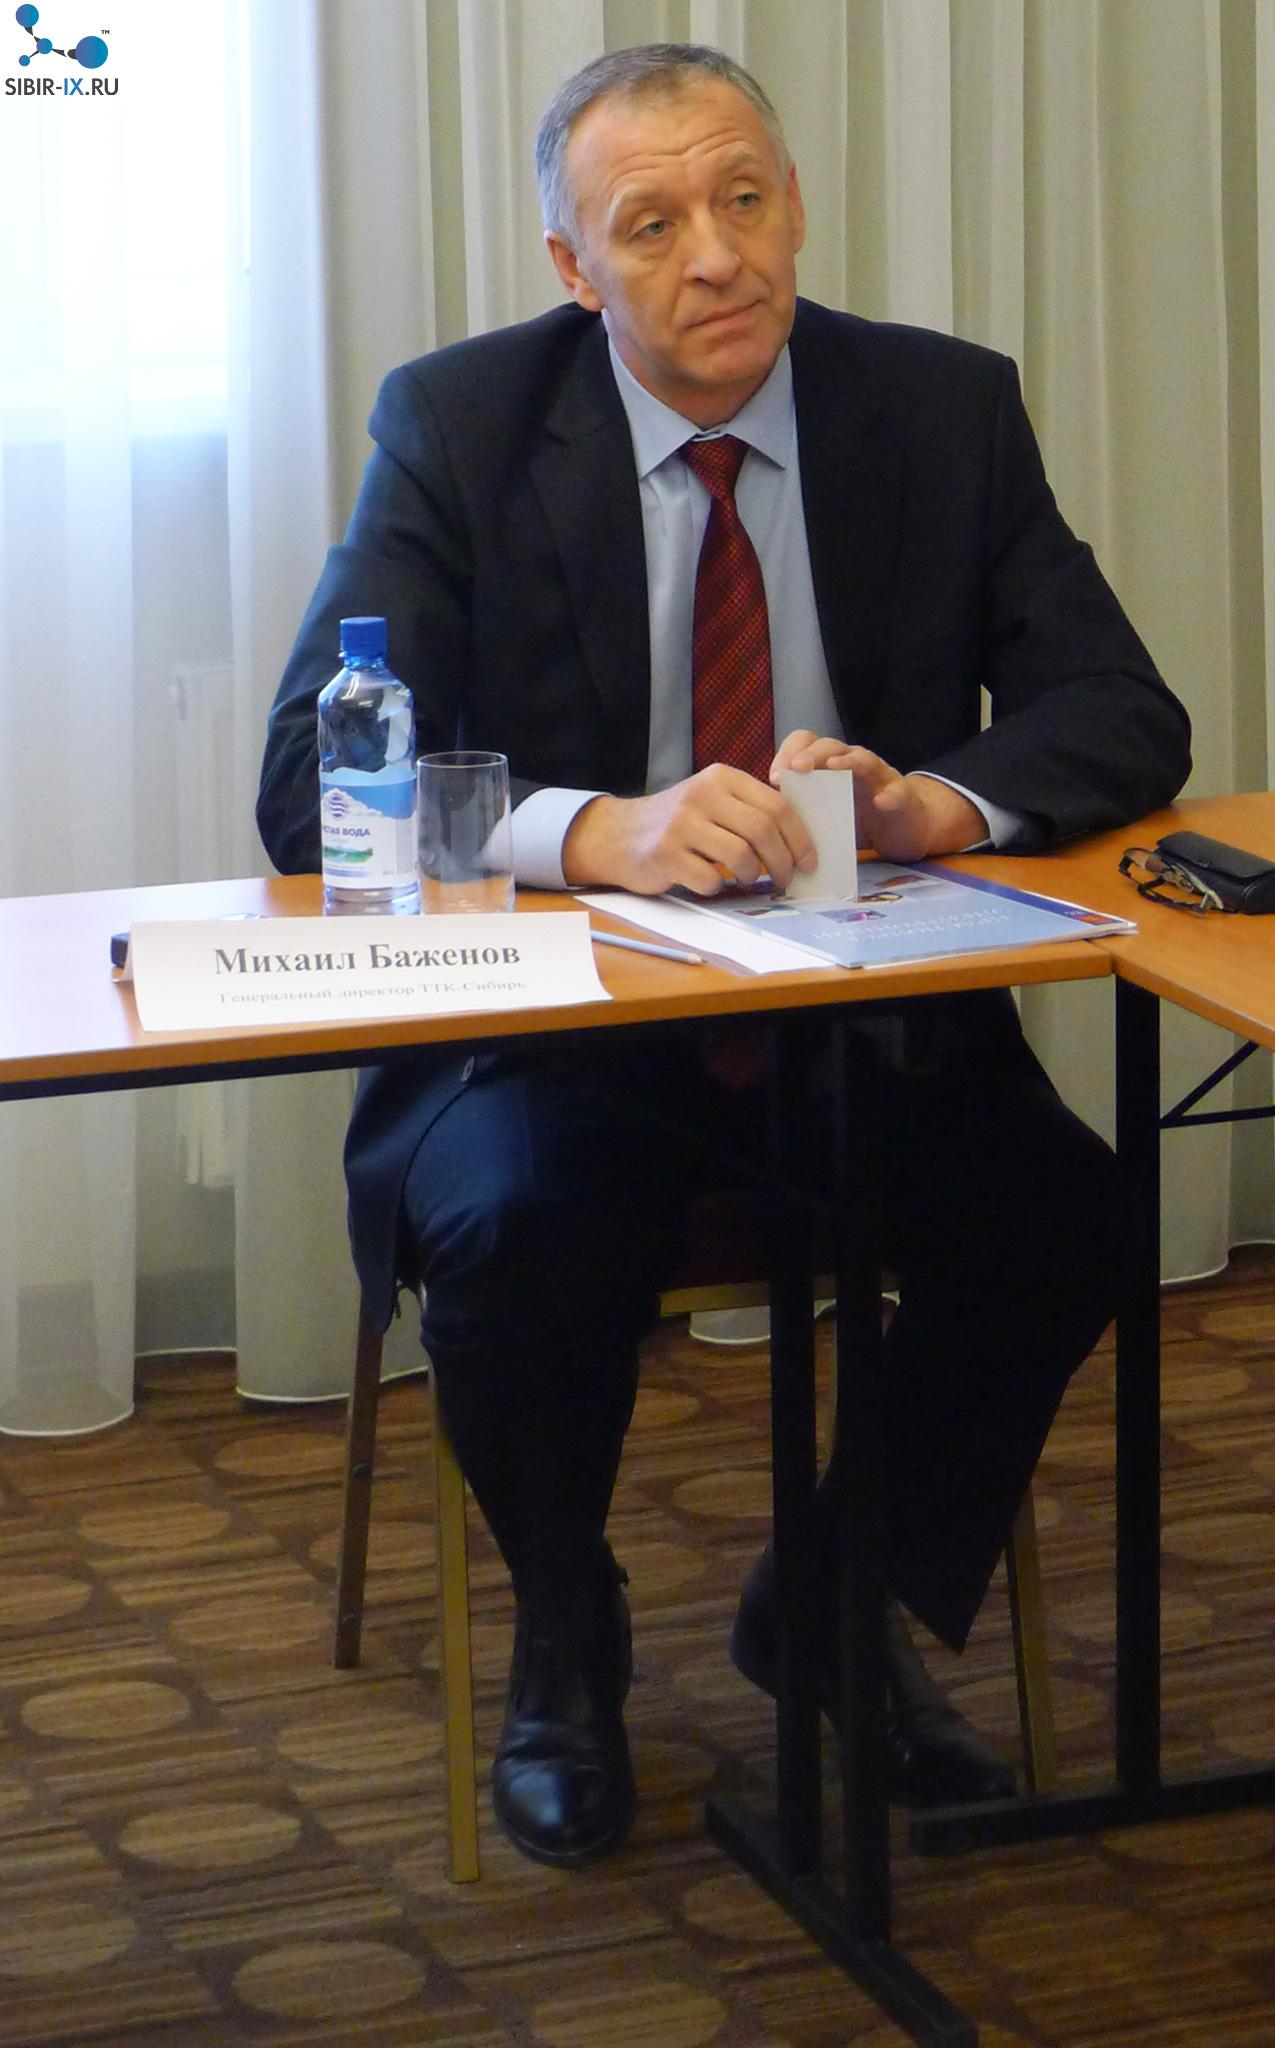 Михаил Баженов